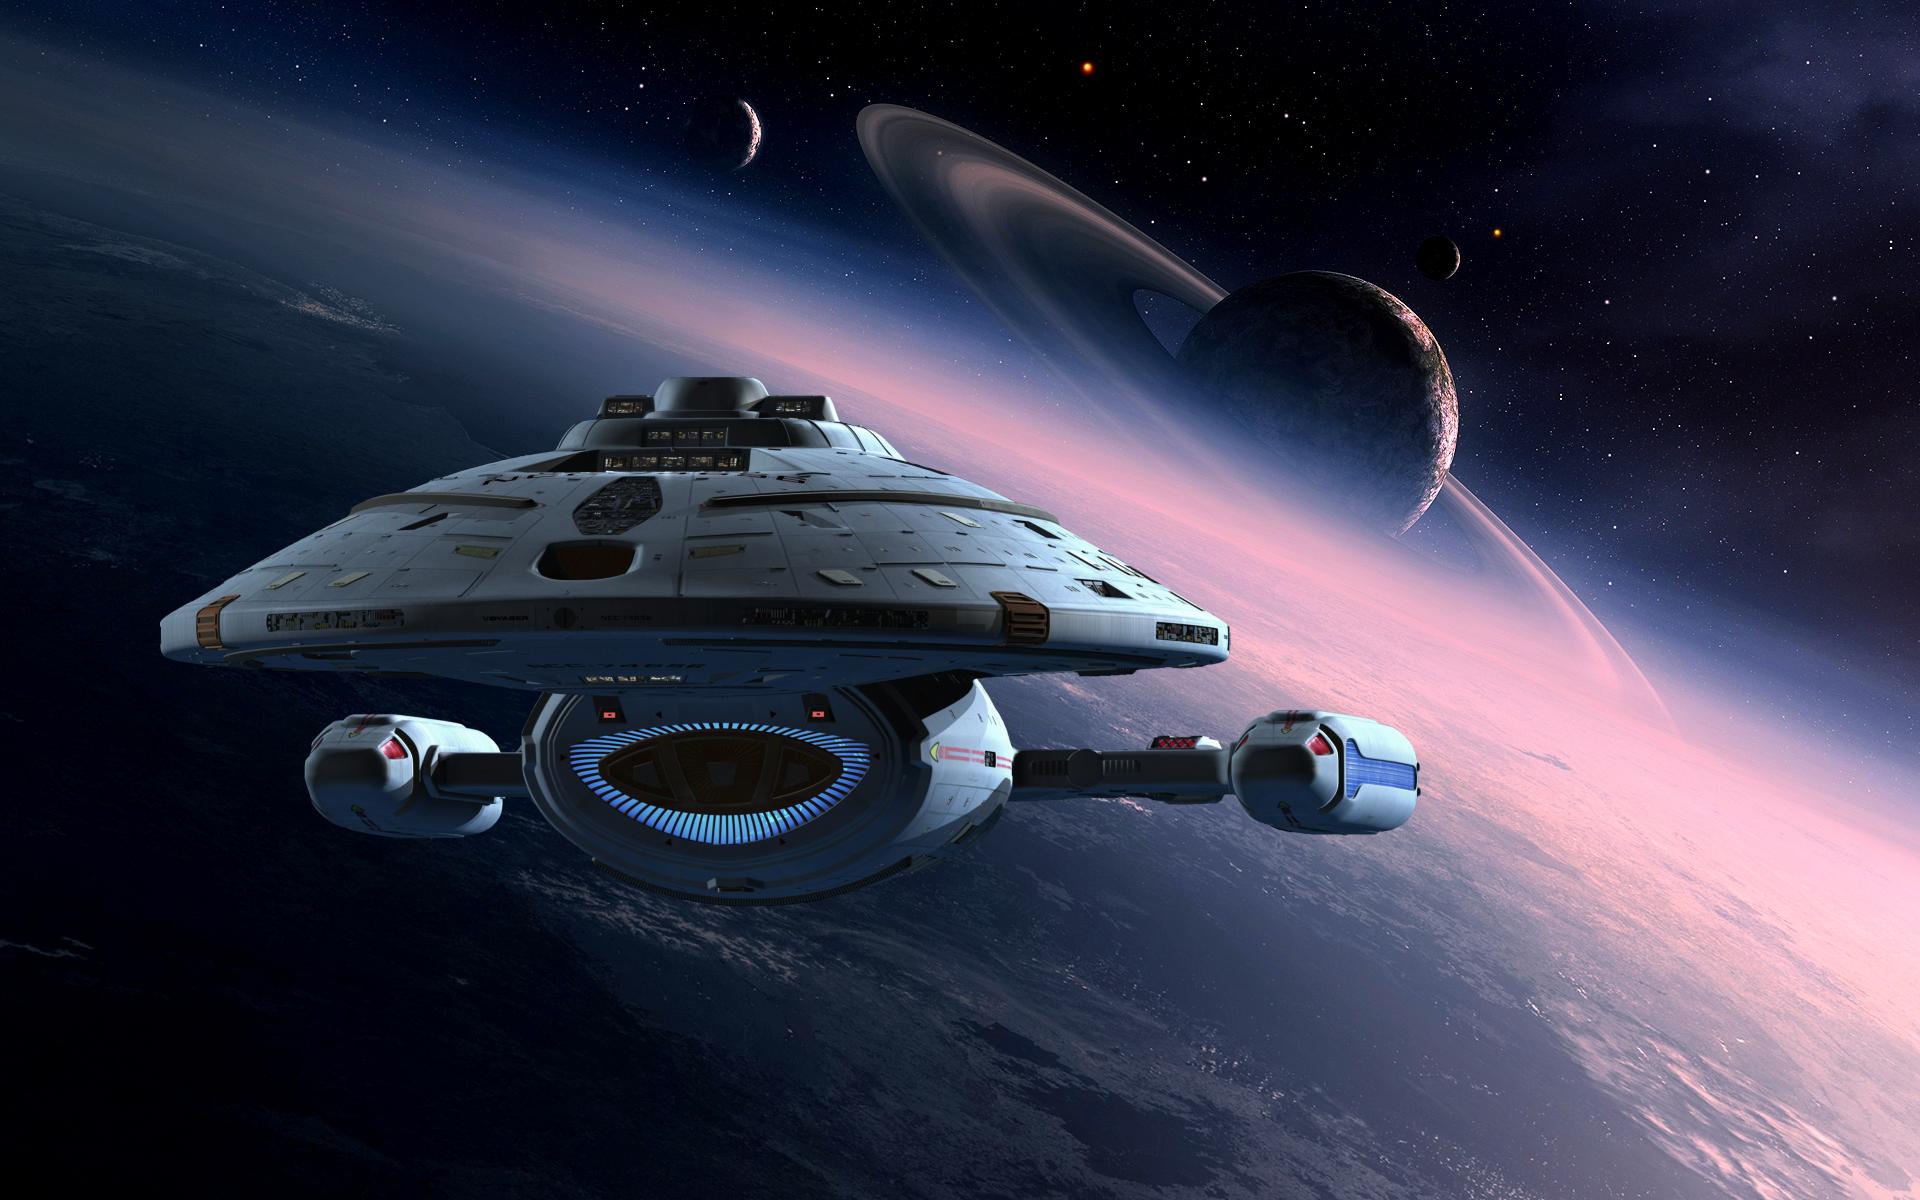 Starship Voyager Tv Show Star Trek Voyager Star Trek Voyager Science Fiction Star Trek Wallpaper Star Trek Voyager Ship Star Trek Starships